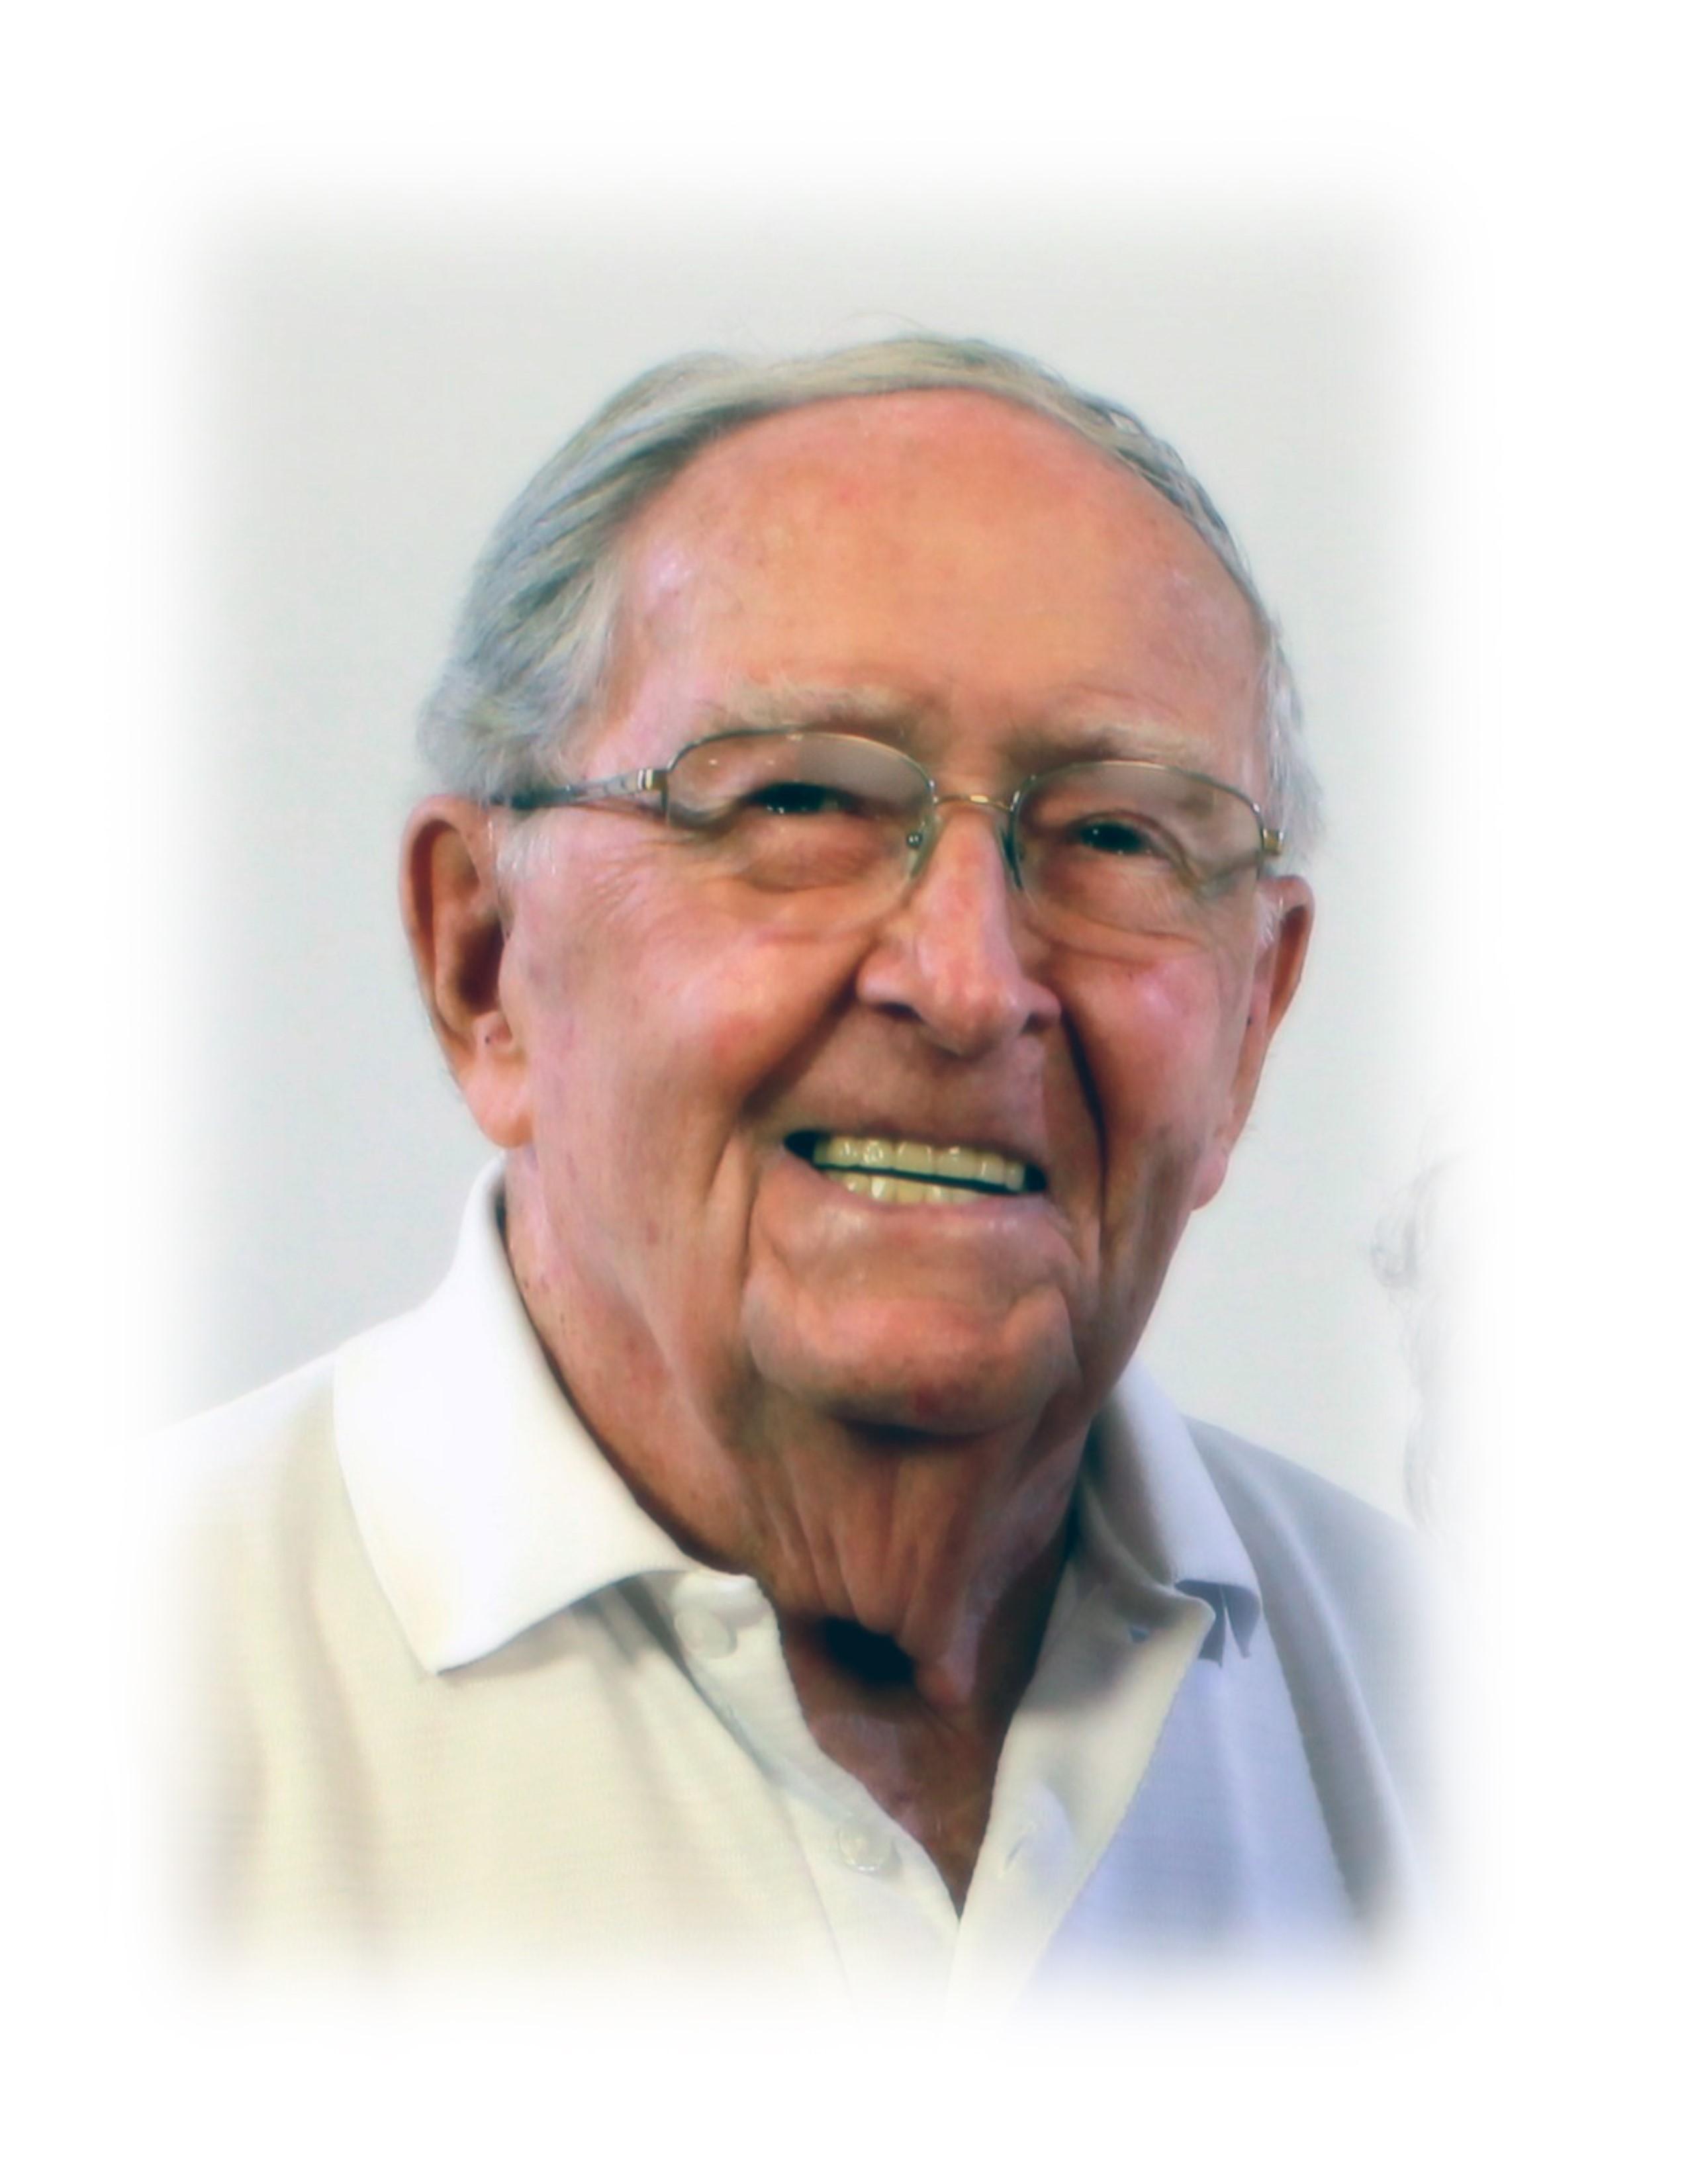 WCSR Owner Passes Away